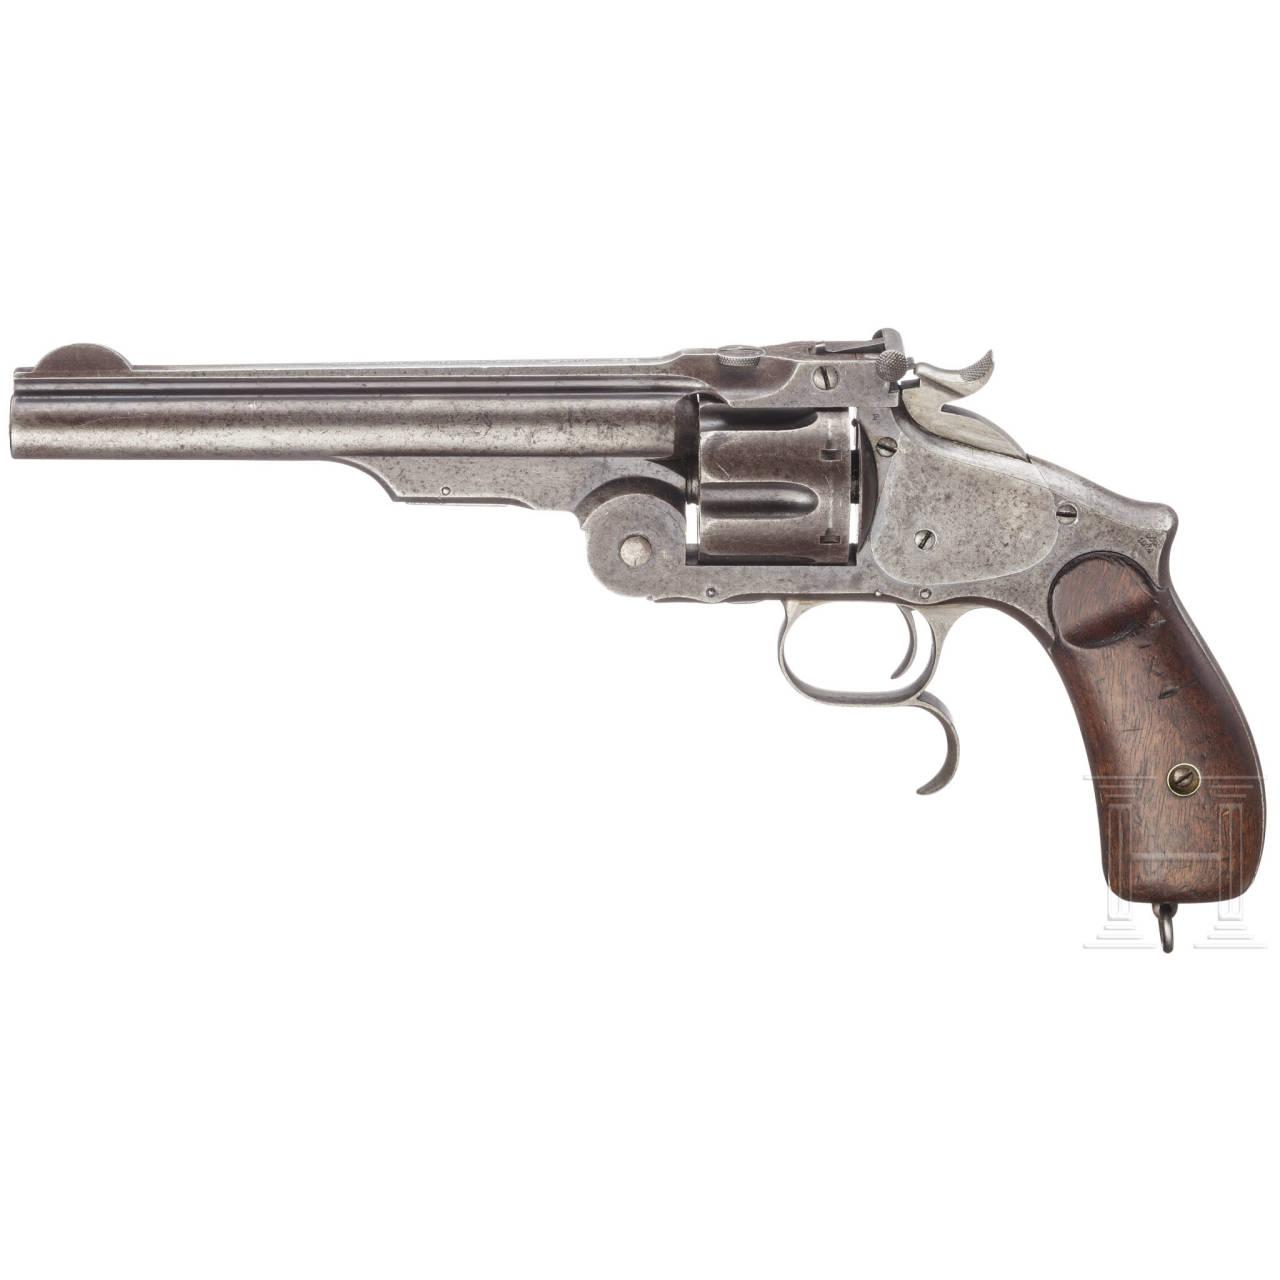 Smith & Wesson No. Three Russian, 3rd Mod. (Mod. 1874), Ludwig Loewe, Berlin